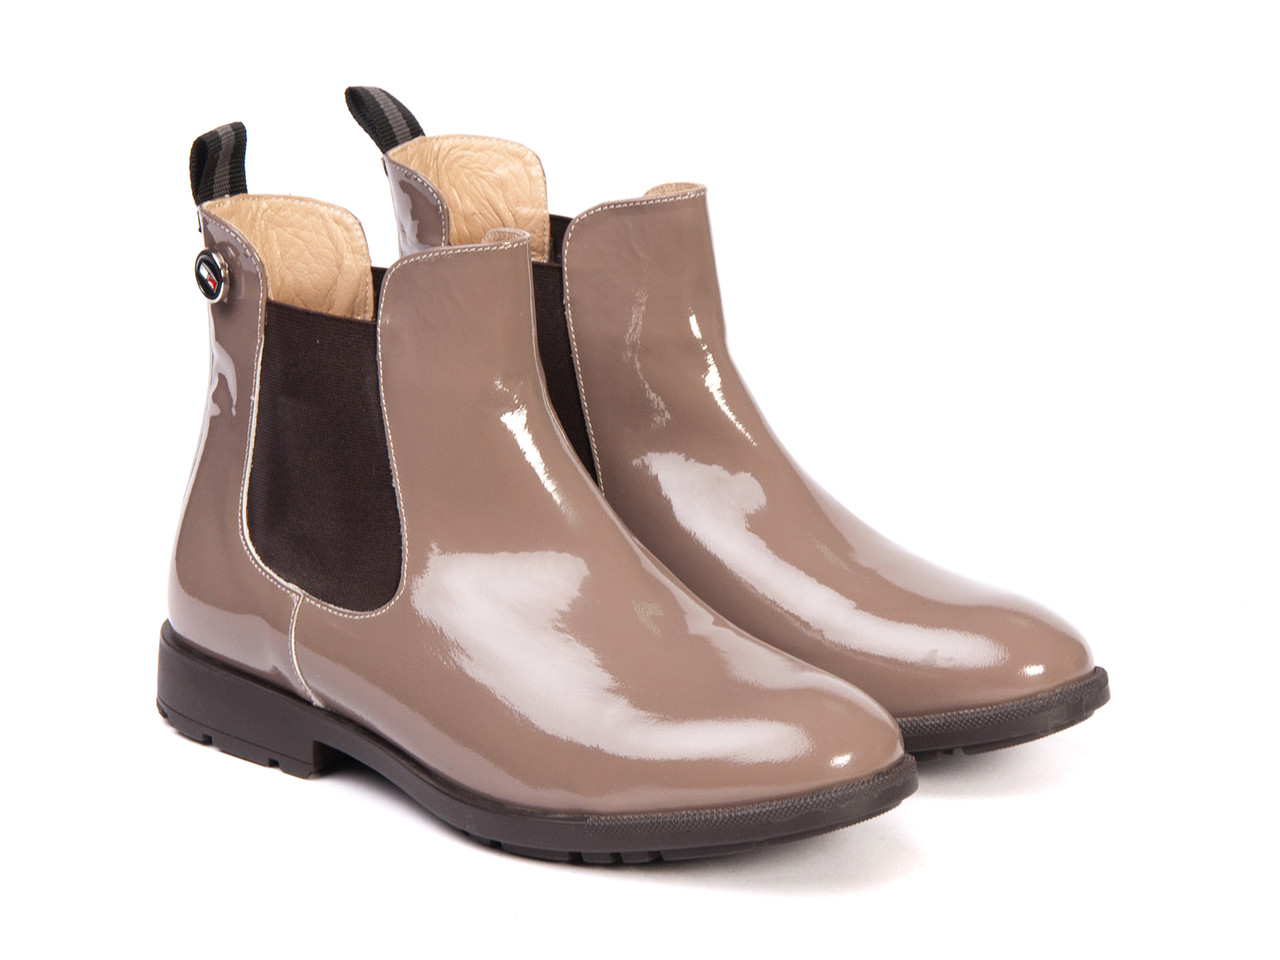 Ботинки Etor 4269-0-7134-1405 бежевые